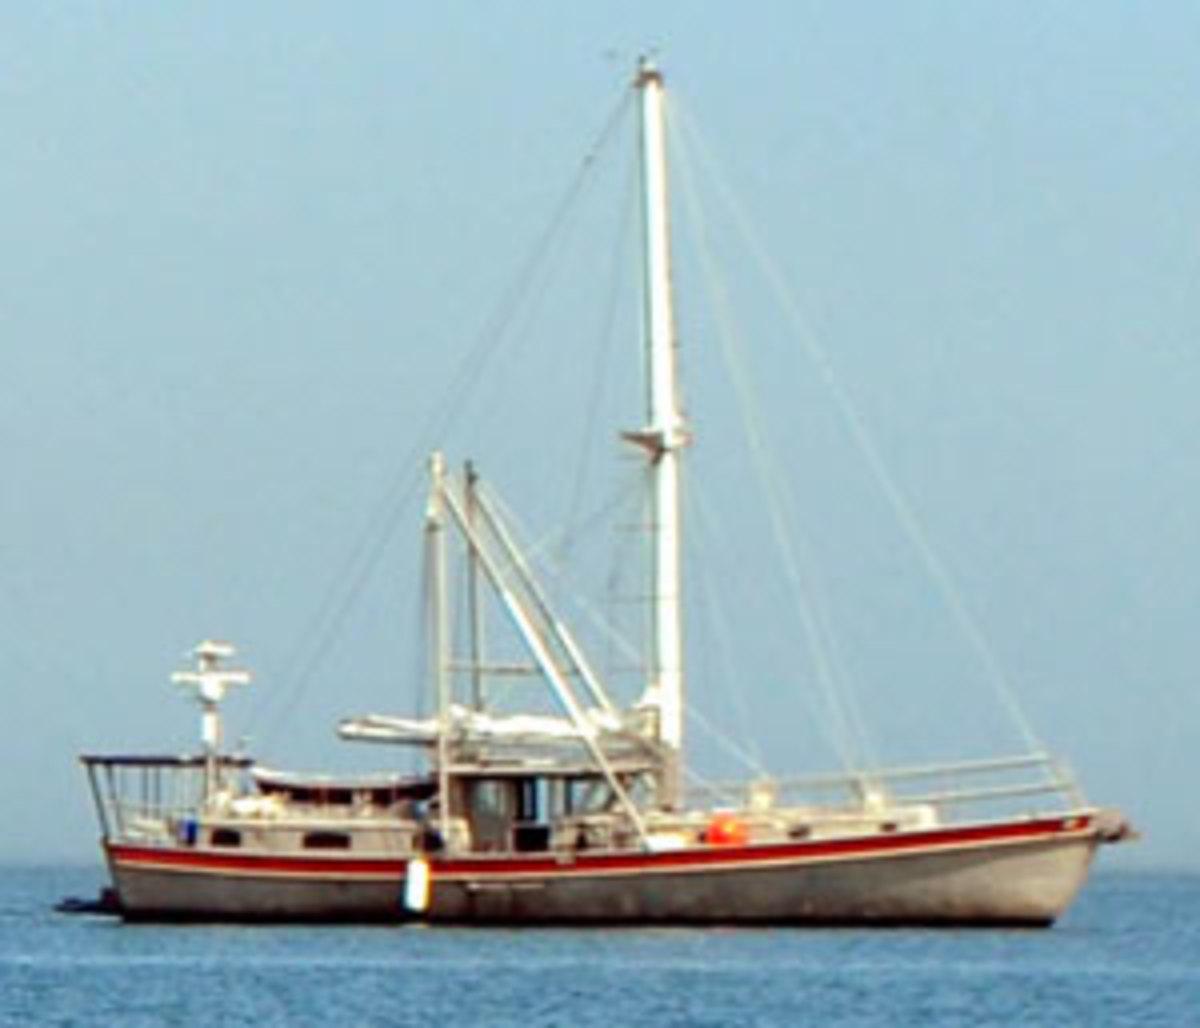 Trawler closeup